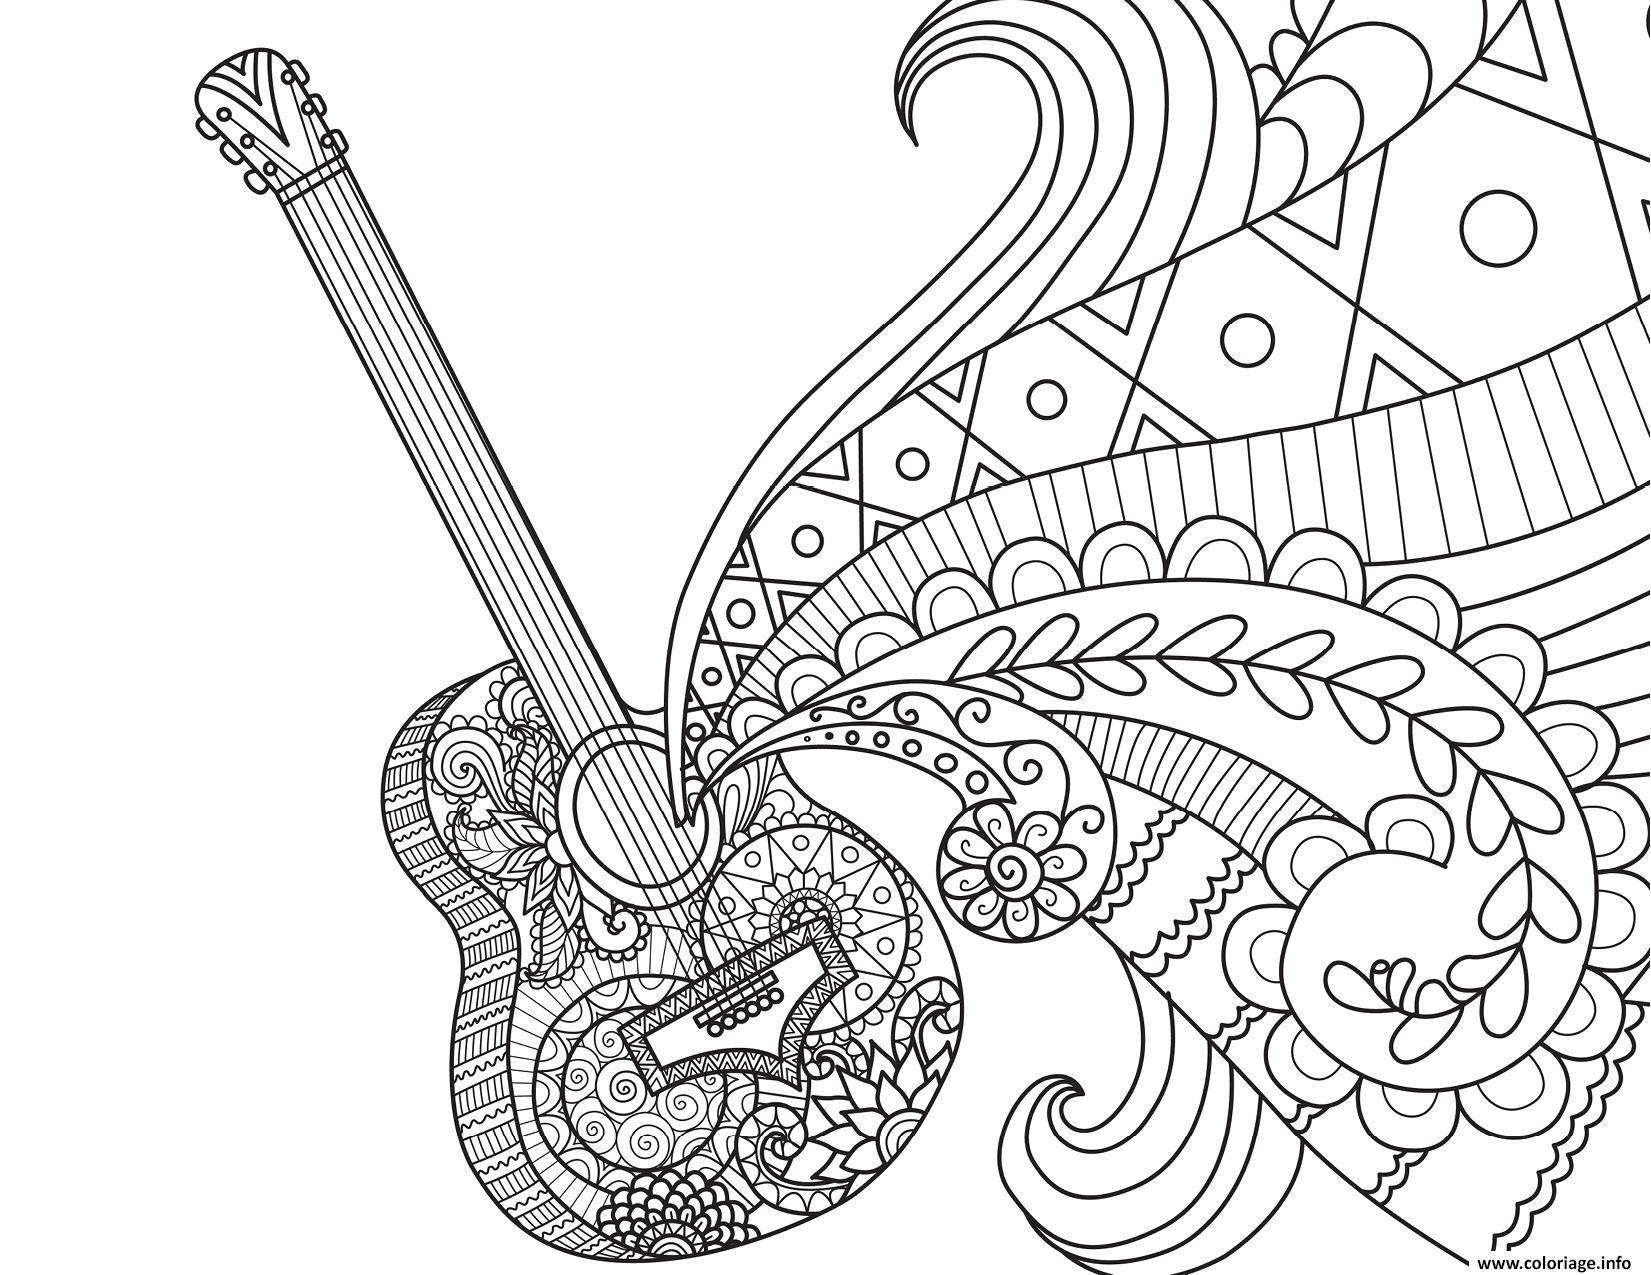 Coloriage Coco Disney Guitare De Miguel Par Bimbimkha dessin